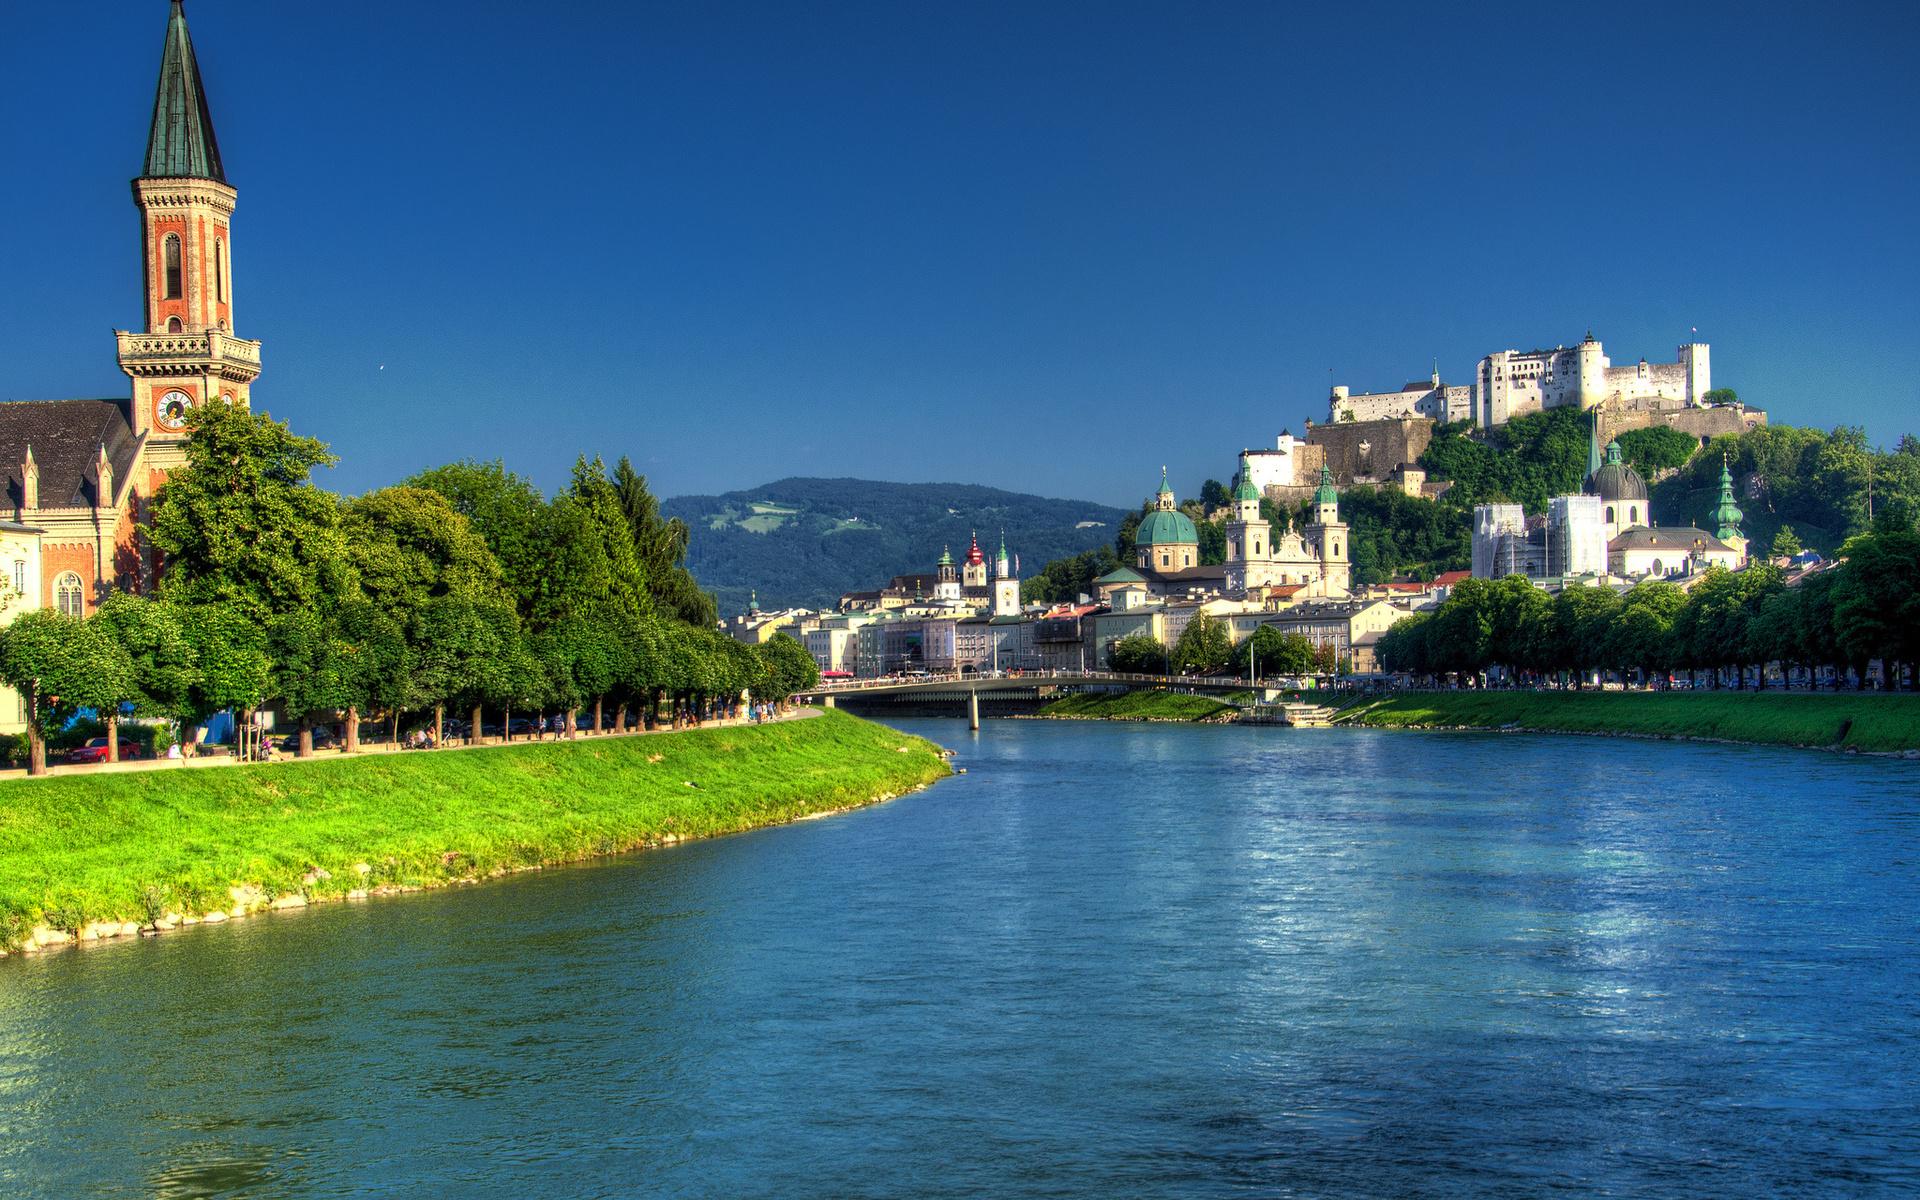 Salzburg HD Wallpaper Background Image 1920x1200 ID430057 1920x1200